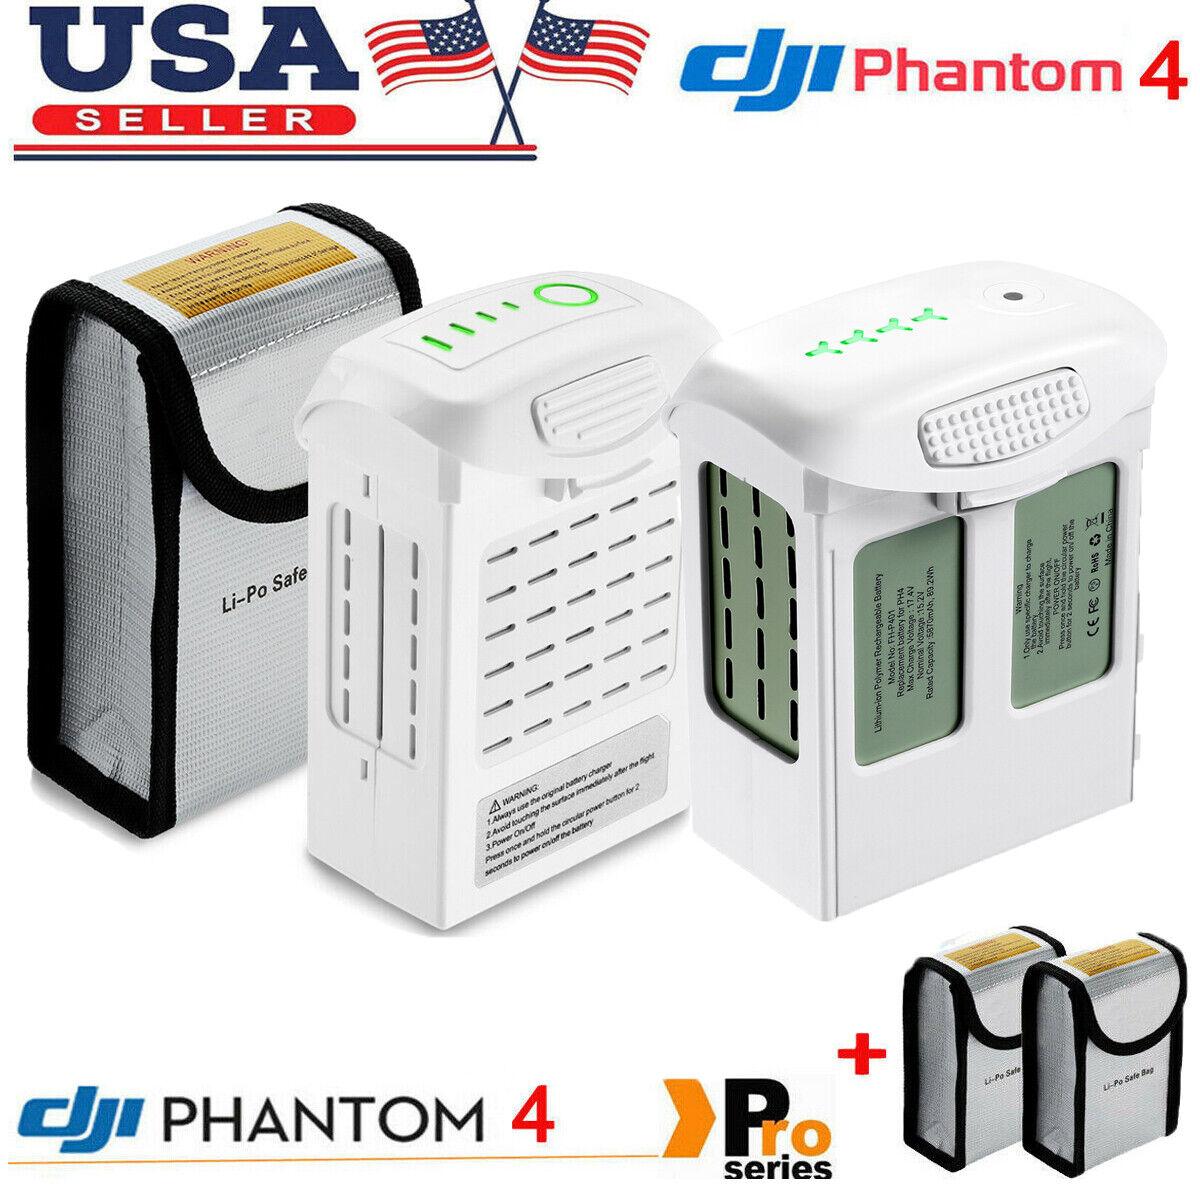 15 2v 5350mah lipo battery and intelligent